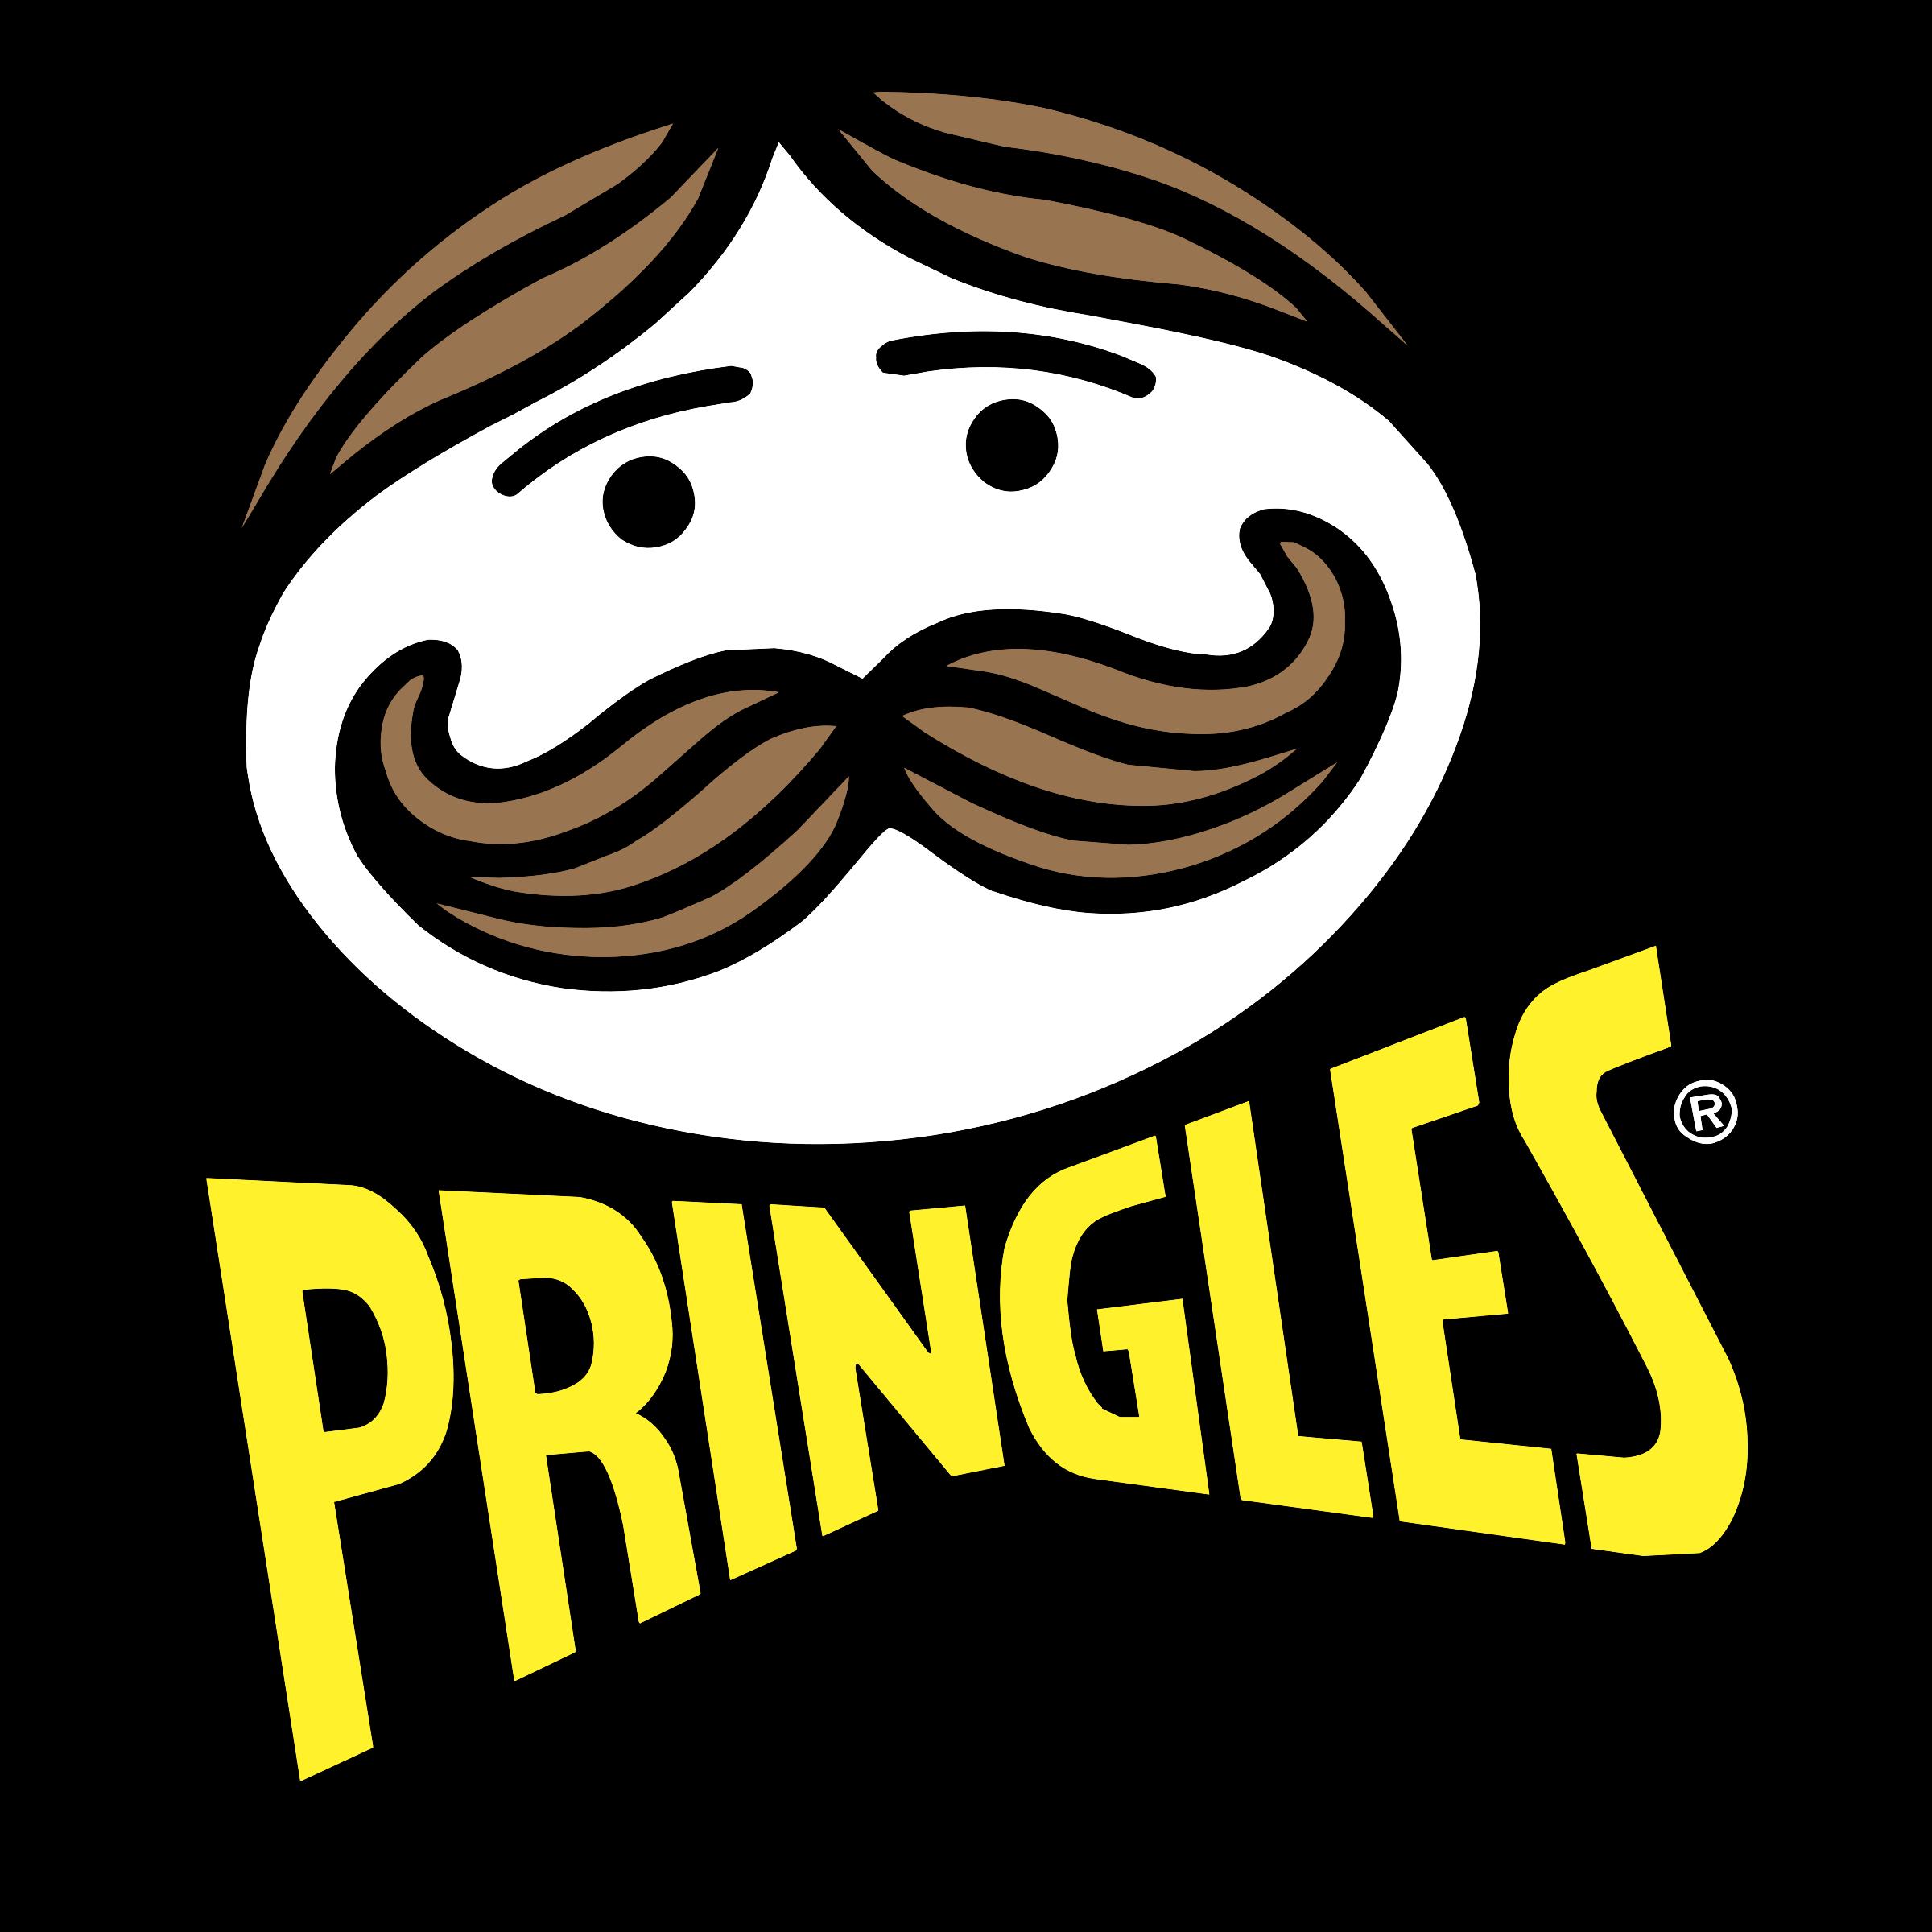 Pringles Logo PNG Transparent & SVG Vector.